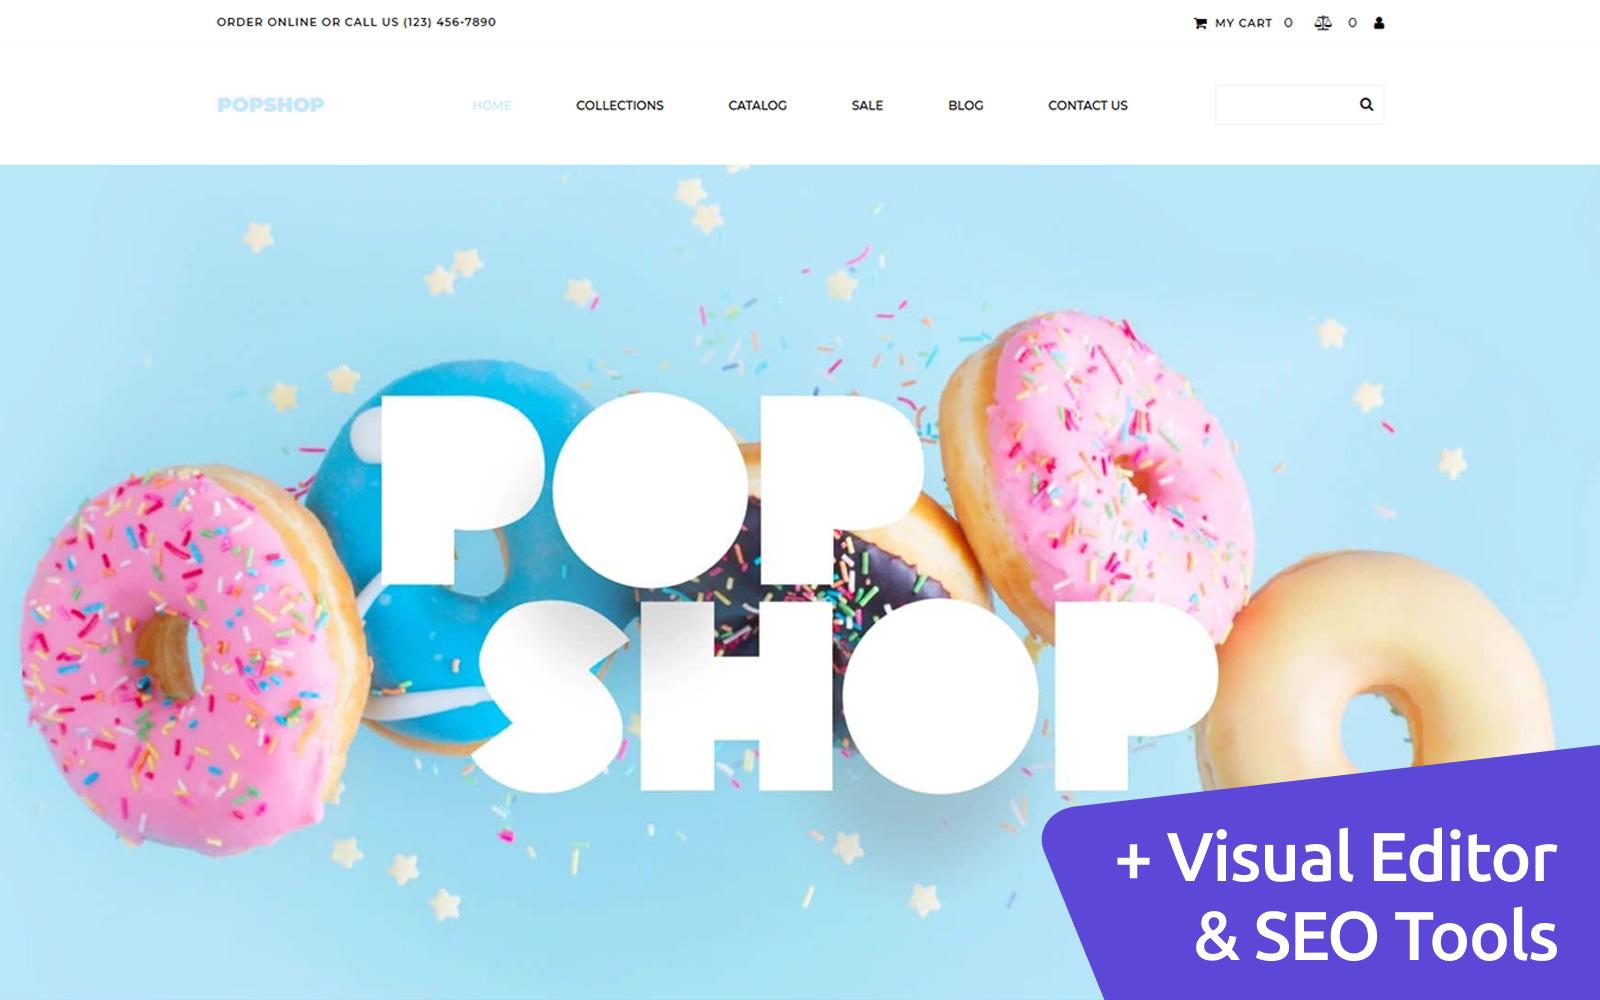 """Popshop - Sweet Shop"" Responsive MotoCMS Ecommercie Template №102547"